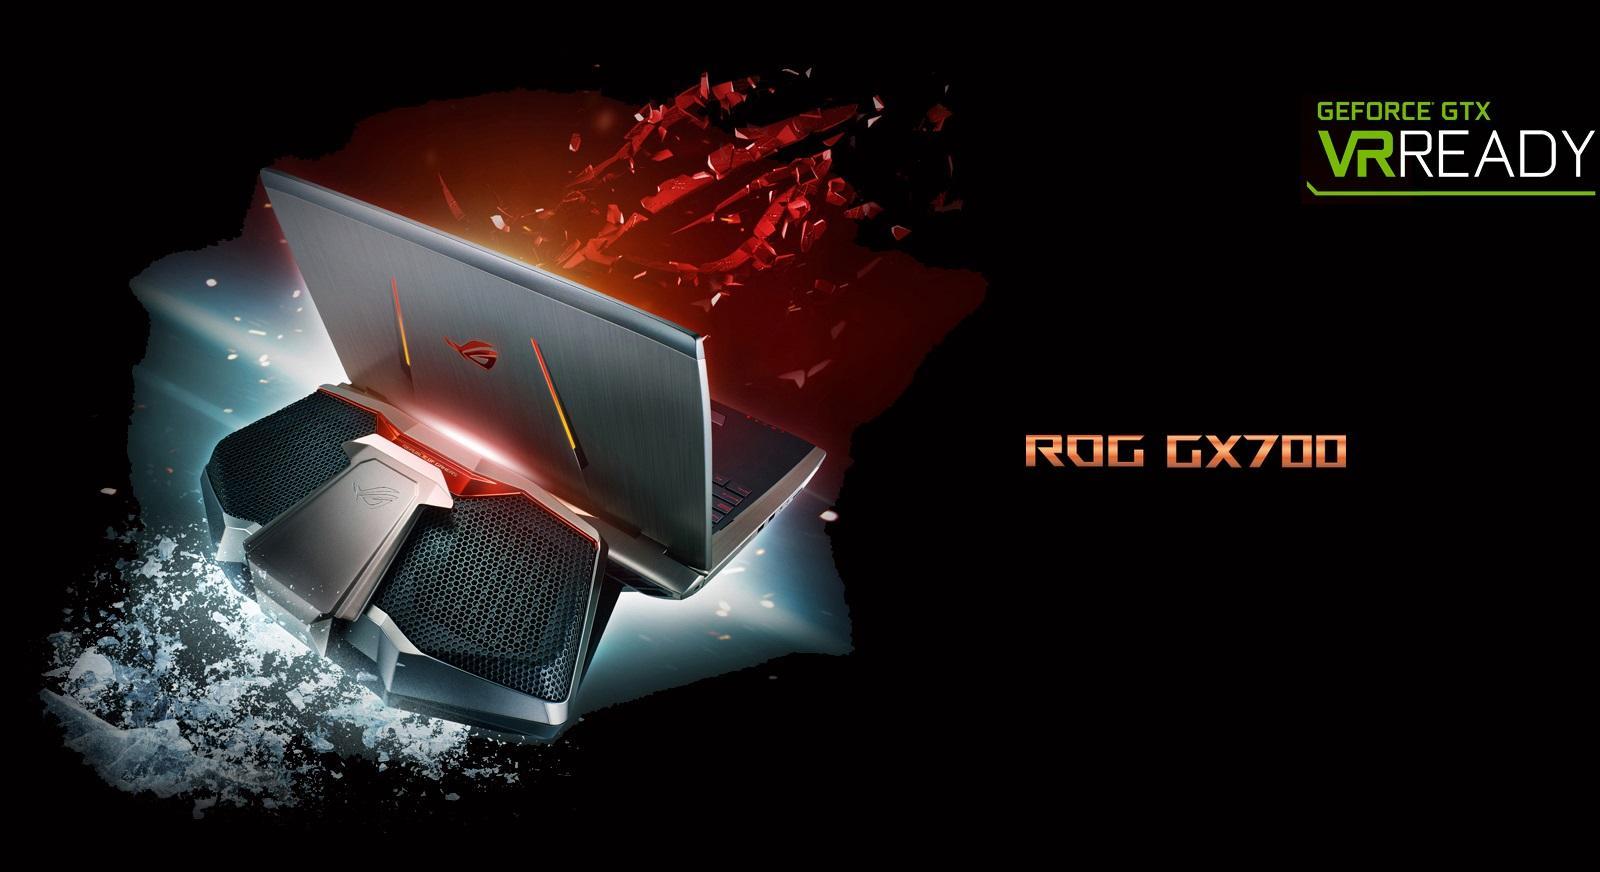 Go de RAM, SSD 512 Go, Nvidia GeForce GTX 980 8G, Windows 10) + Valise